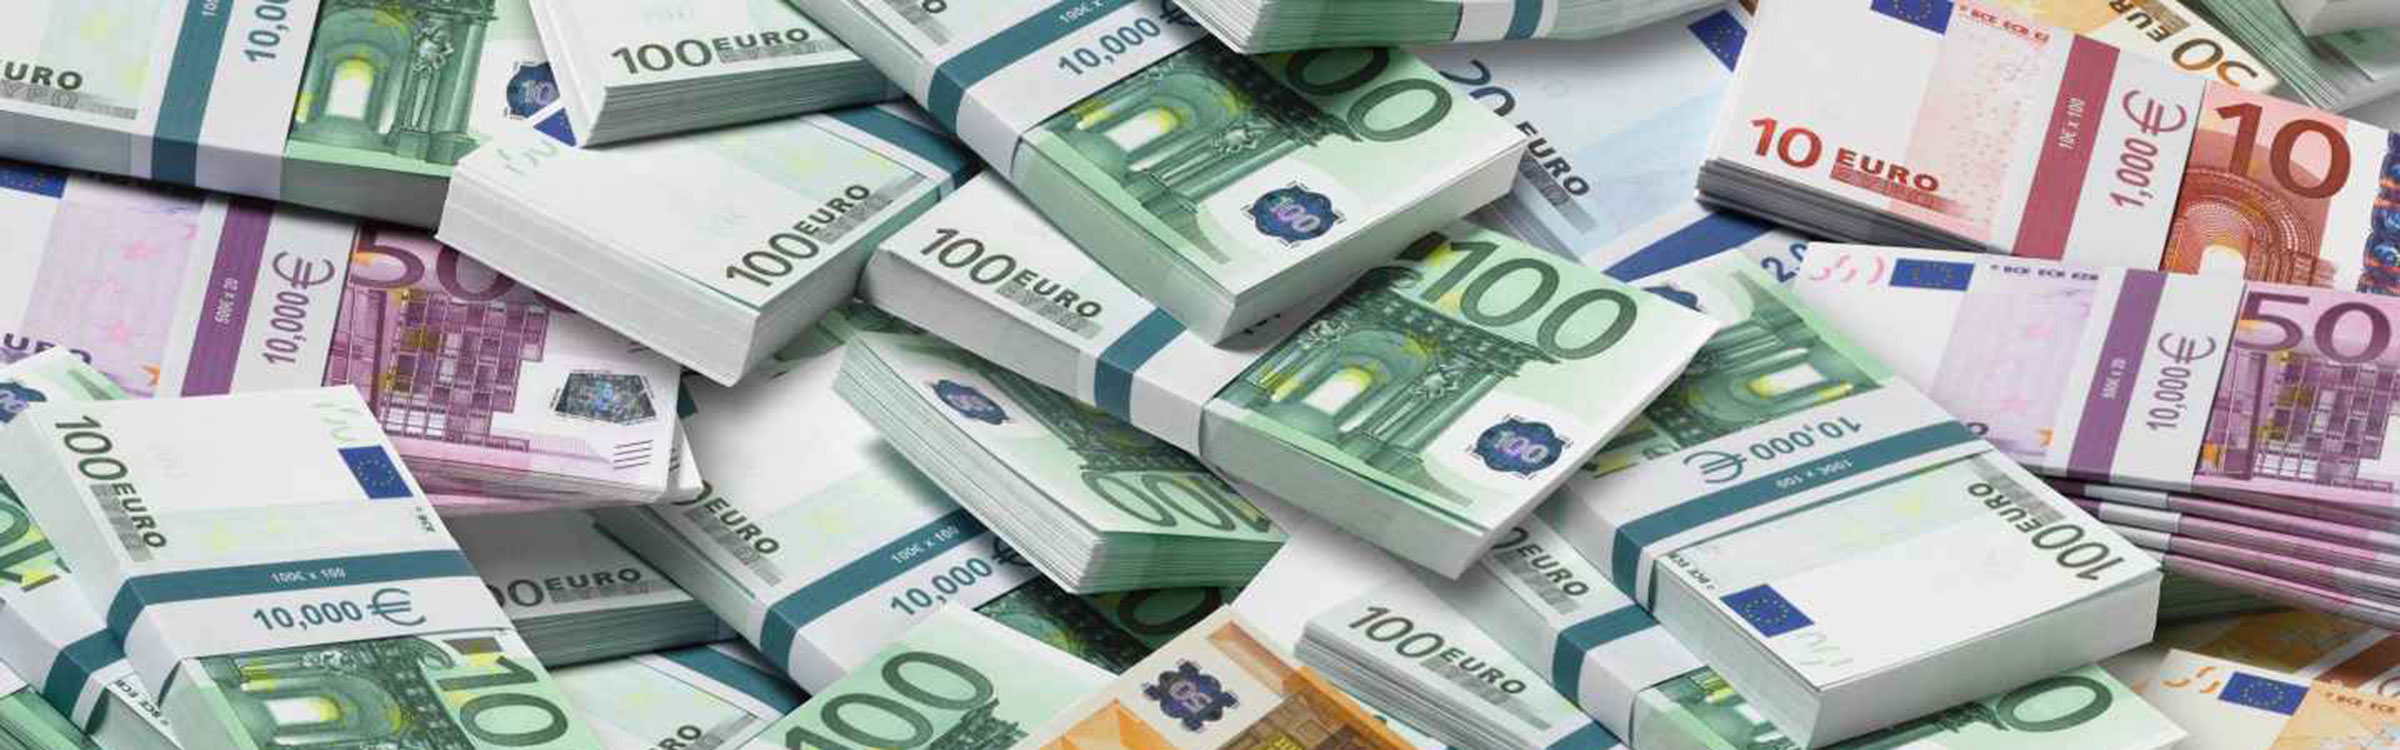 Geld 1440x746